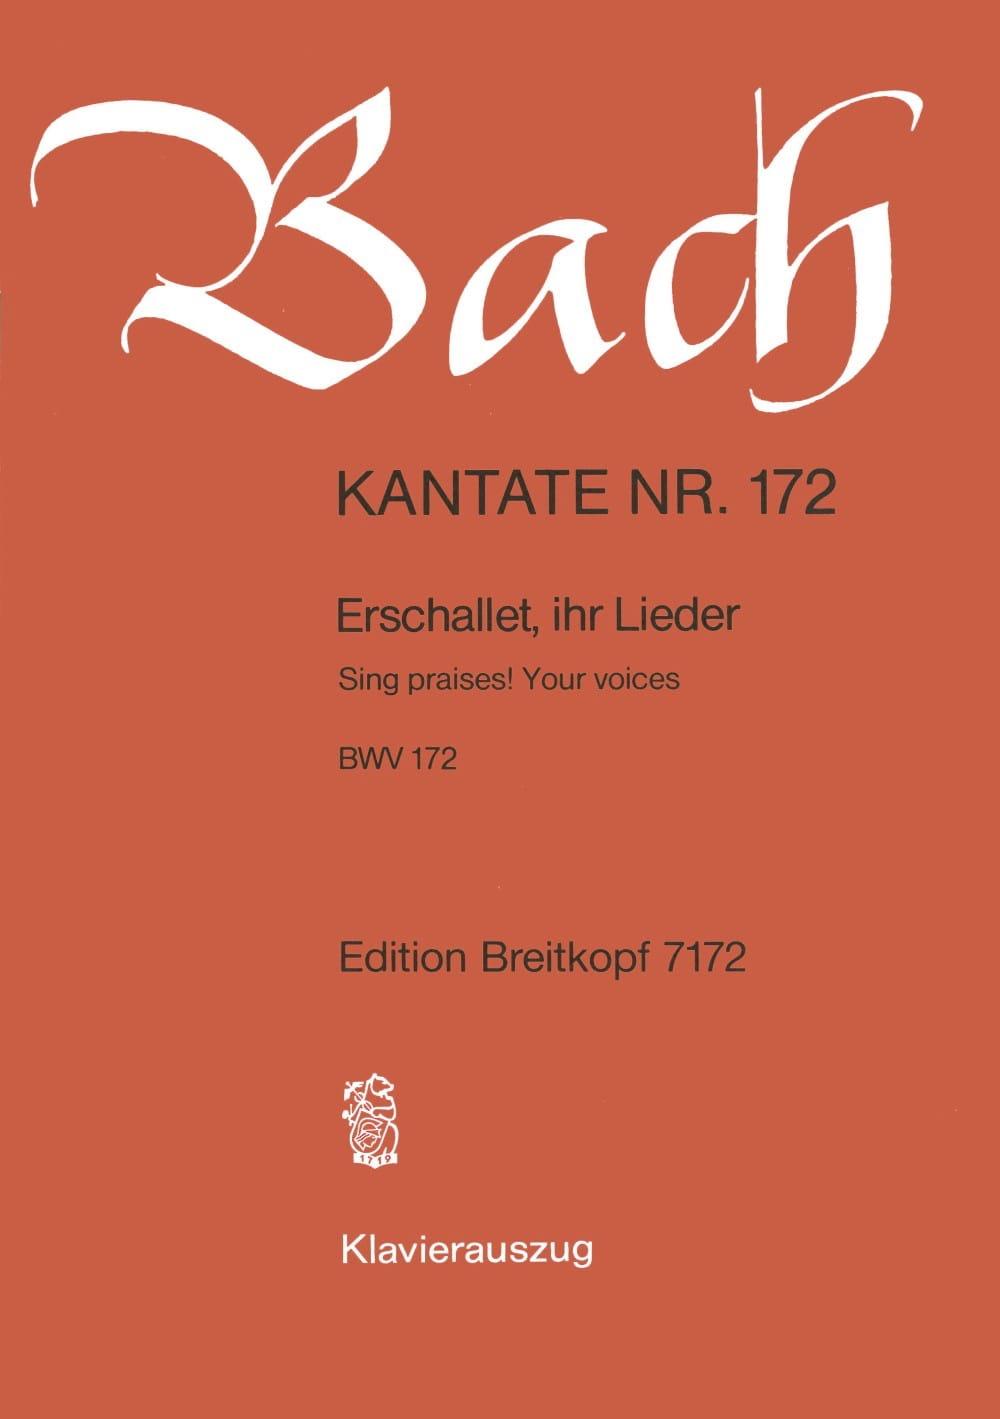 Cantate 172 Erschallet, Ihr Lieder - BACH - laflutedepan.com